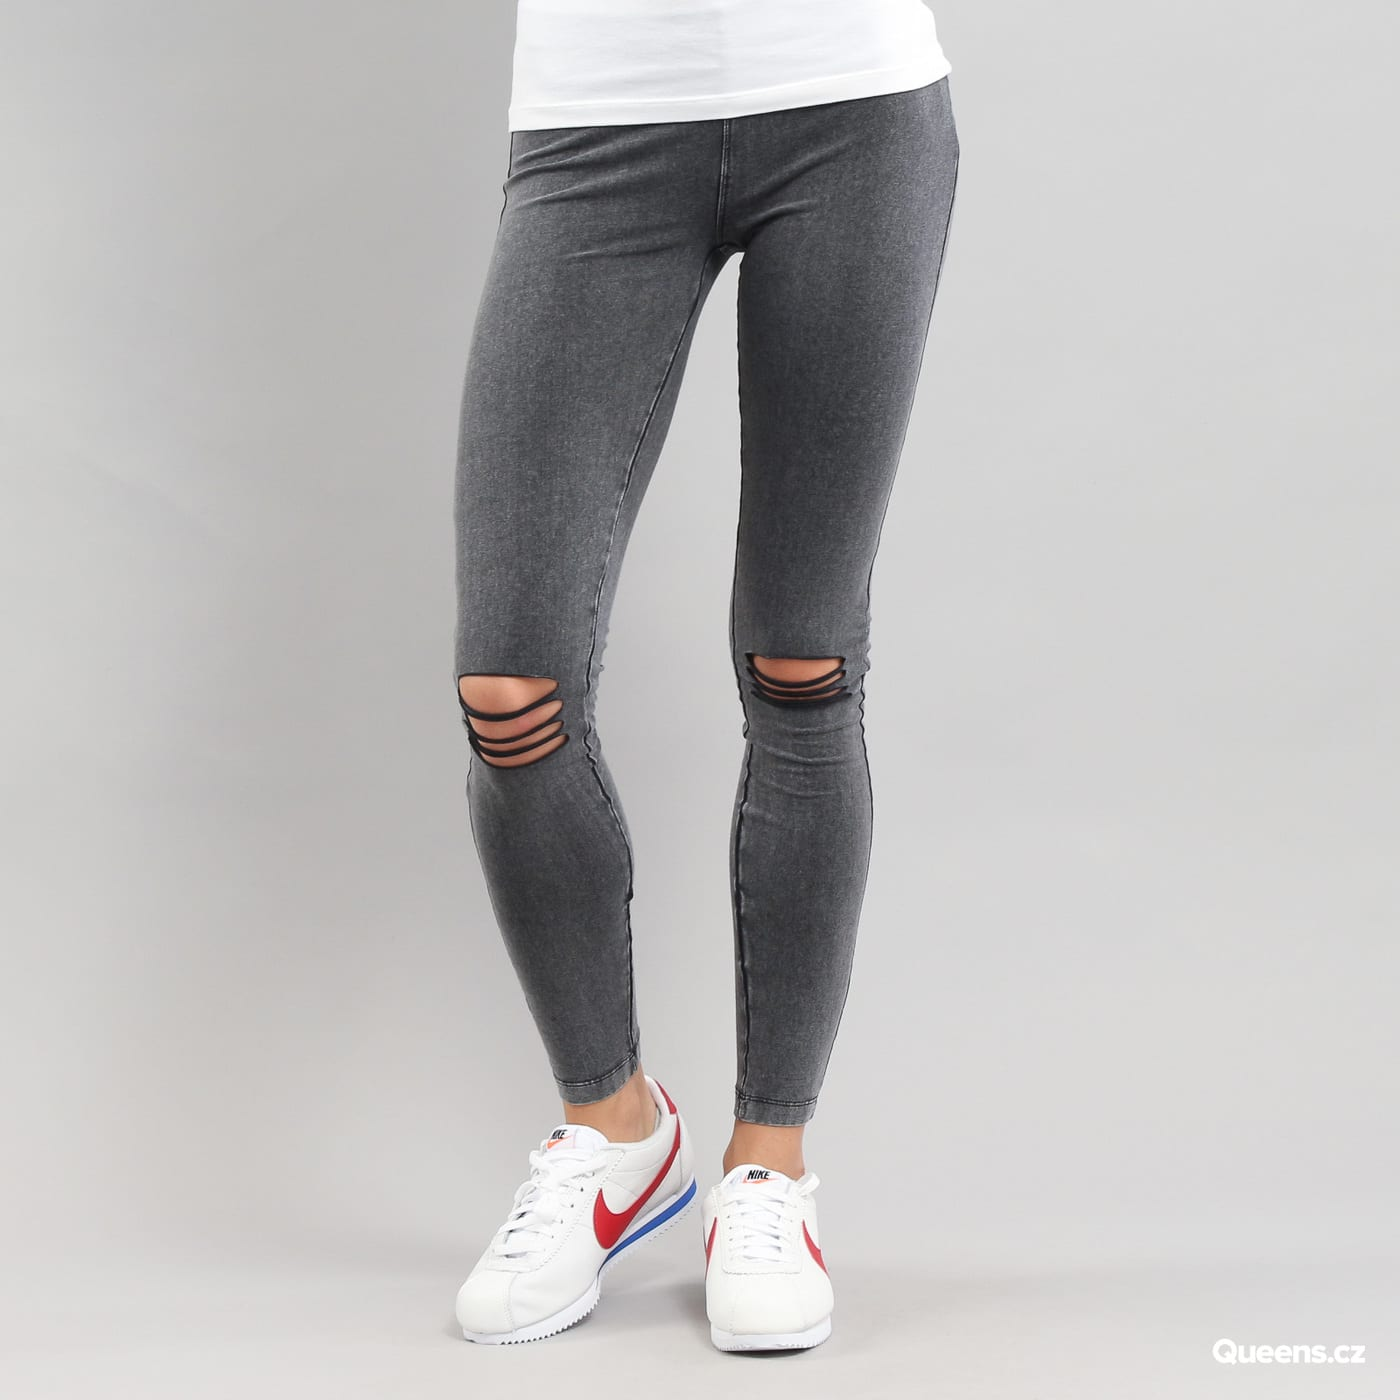 Urban Classics Ladies Cutted Knee Leggings melange black